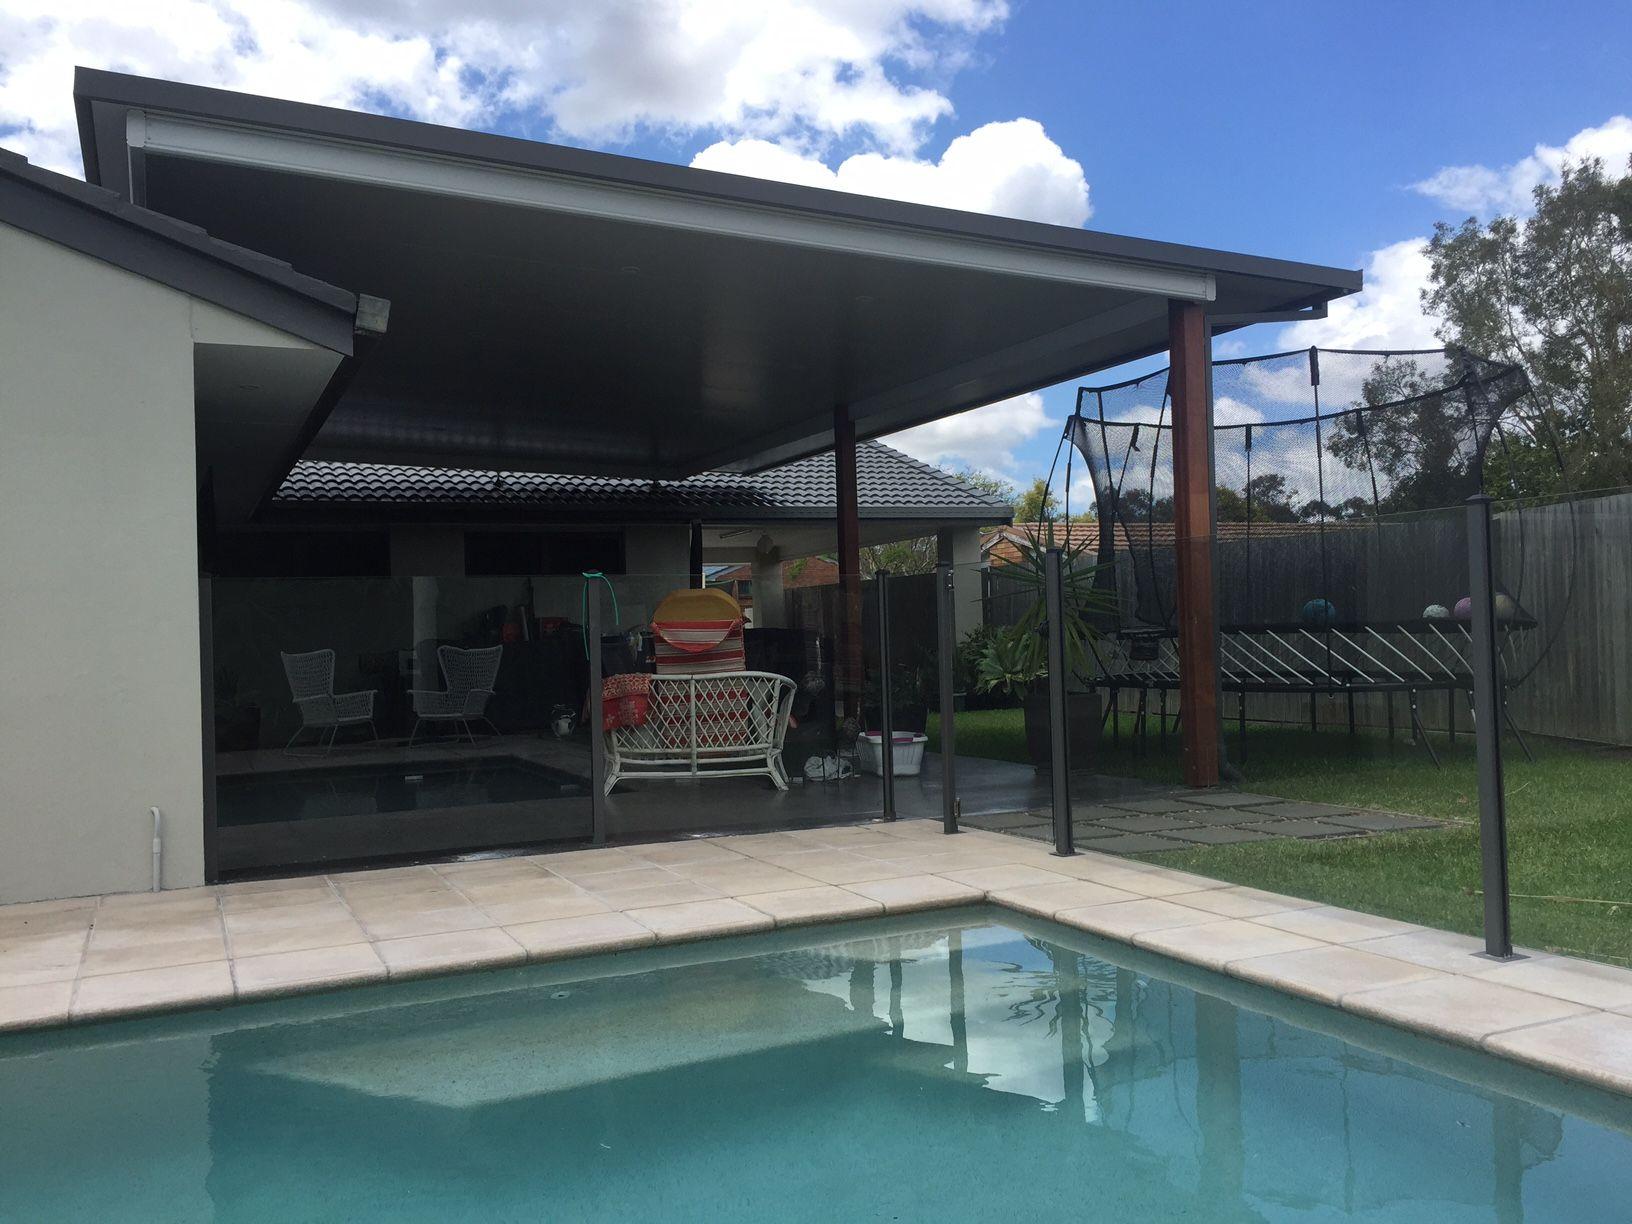 Roof Design Ideas: Insulated Cooldek Flyover Patio, Sunnybank Hills QLD